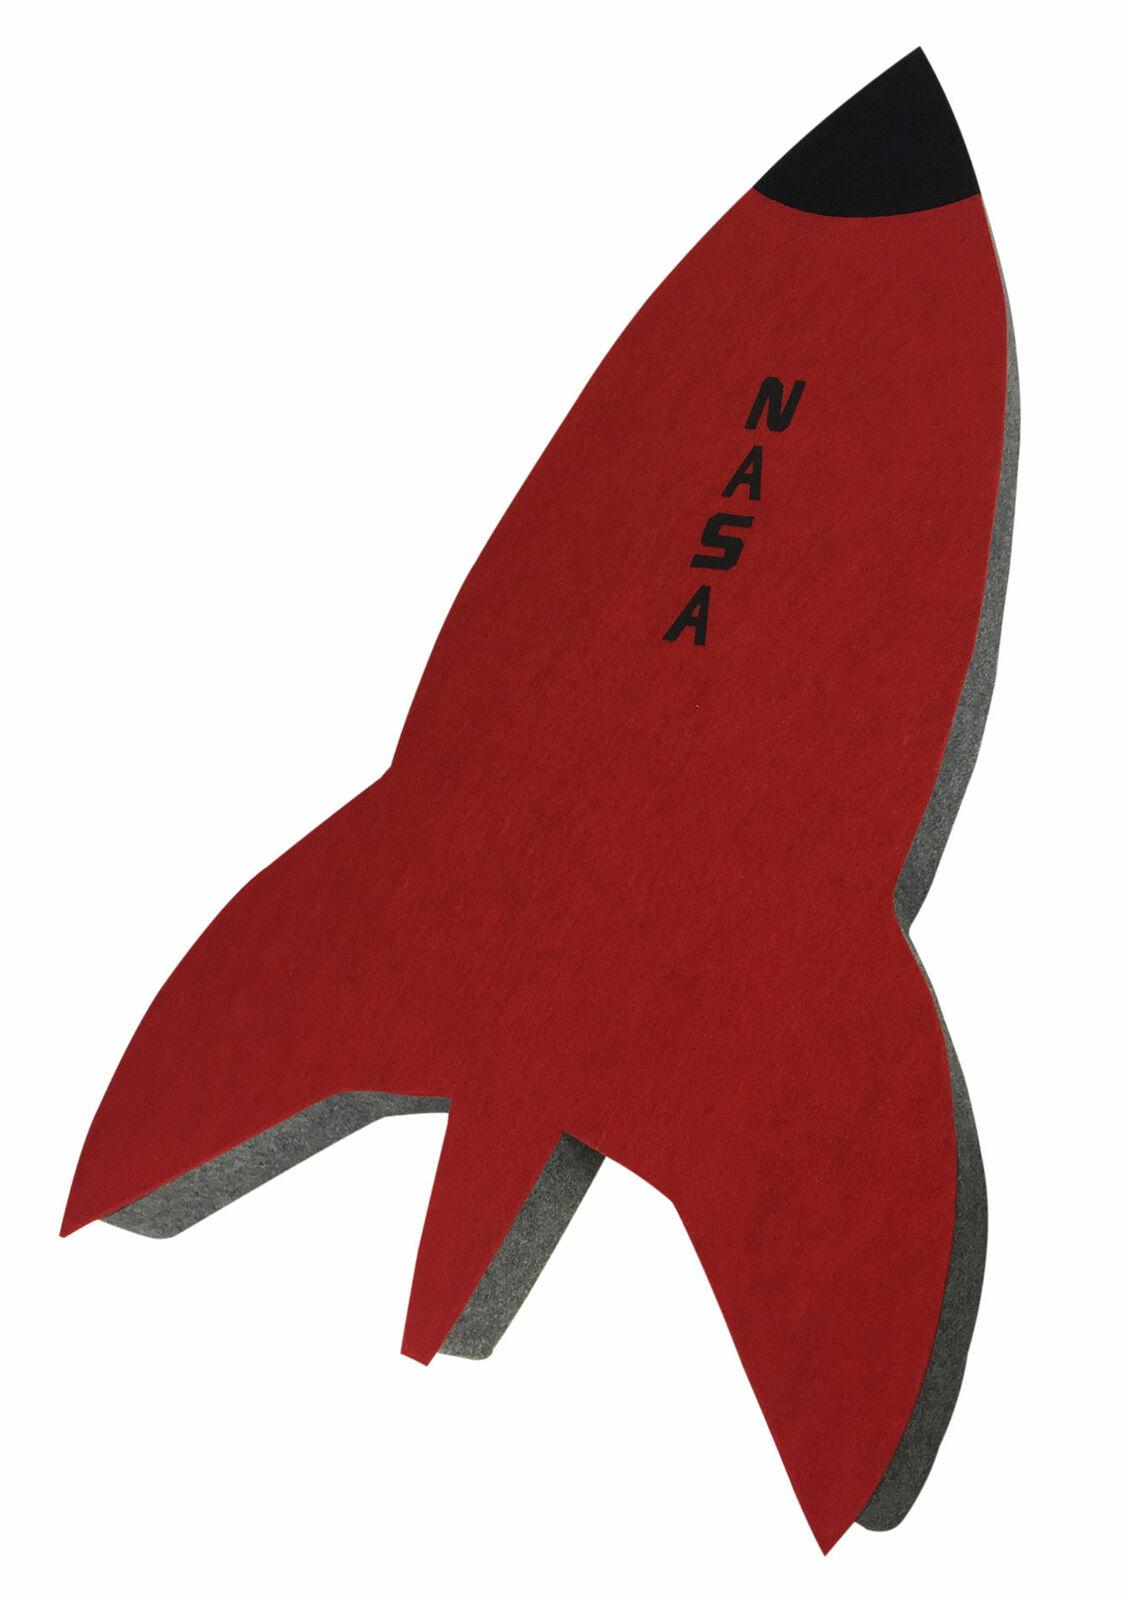 Akustik Schallabsorber, Rakete, Aufhängung wählbar, 117x68x8cm, Akustikelement